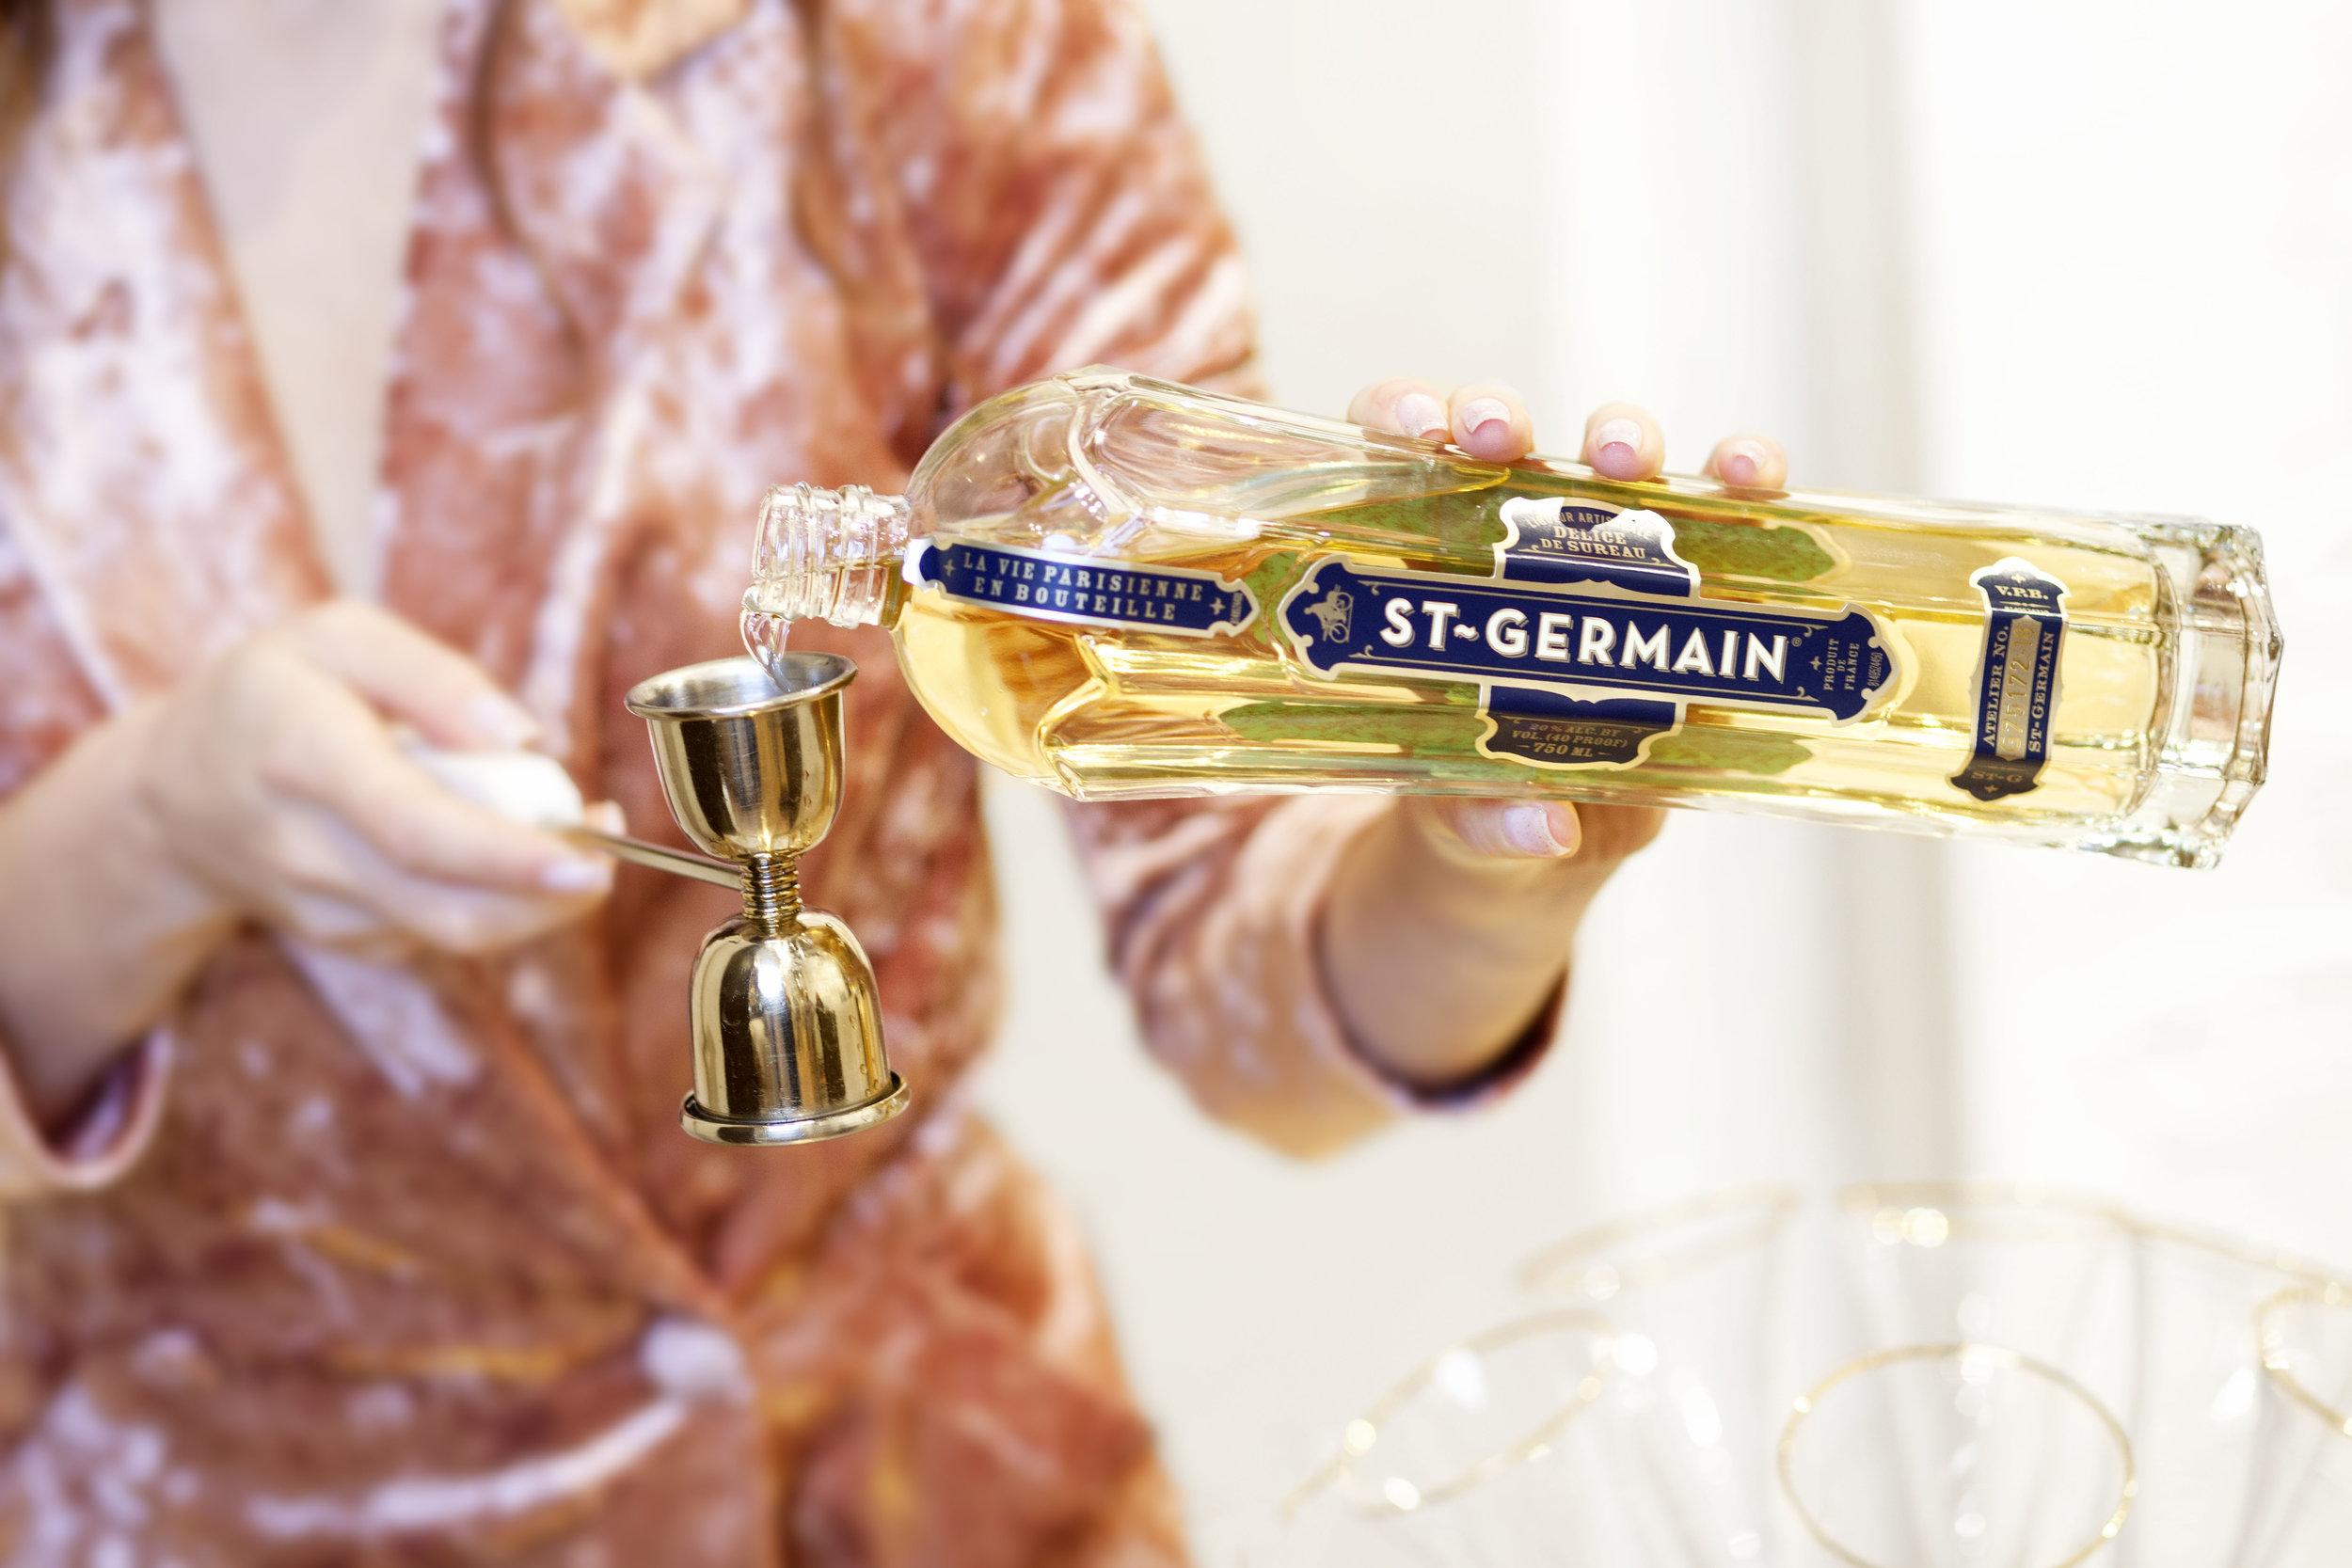 St. Germain in the Victoria Shaker - The Z Bellini